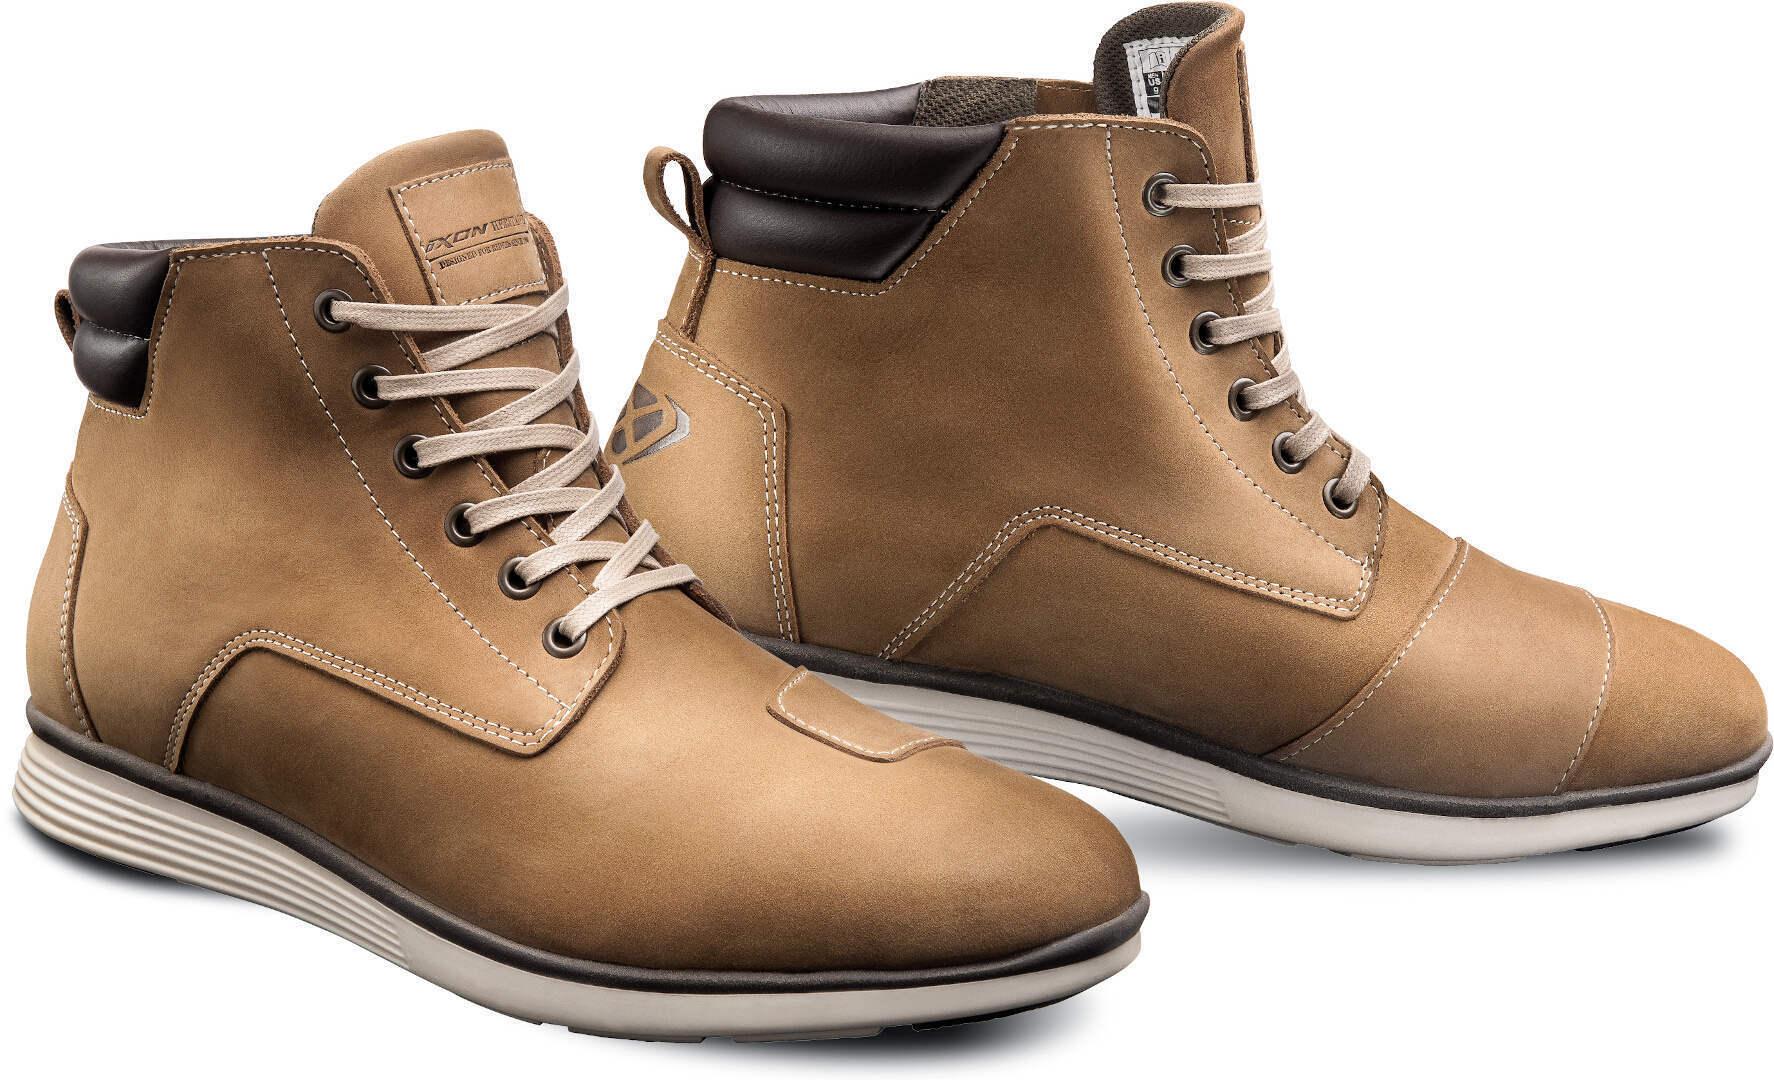 Ixon Akron Chaussures de moto Brun taille : 46